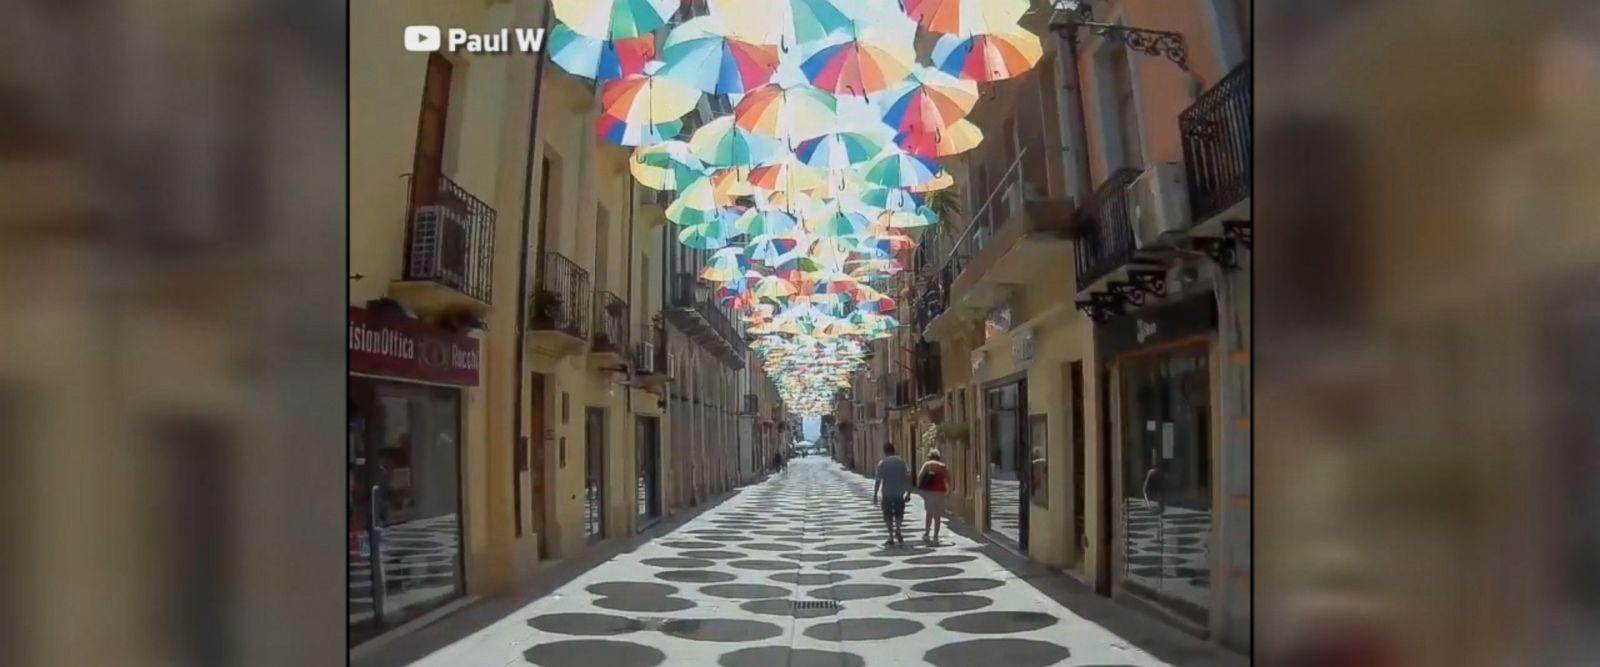 Good Morning America Umbrella : Vibrant umbrella art display dazzles sardinia visitors